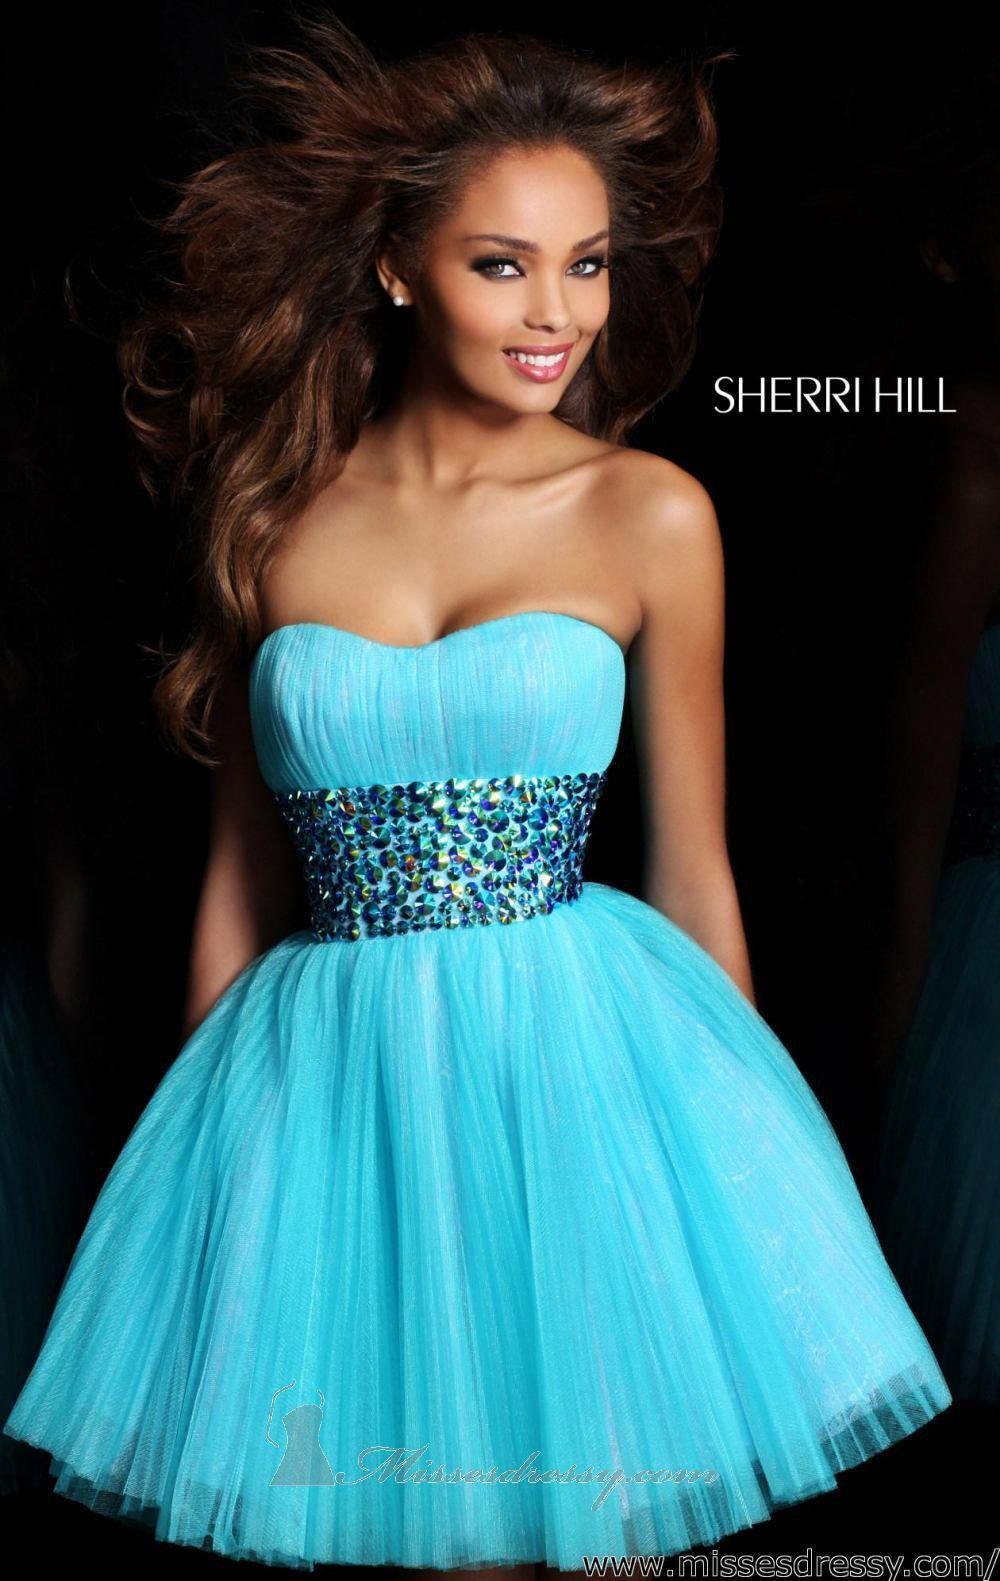 Sherri Hill 21163 Dress - MissesDressy.com | Prom | Pinterest ...